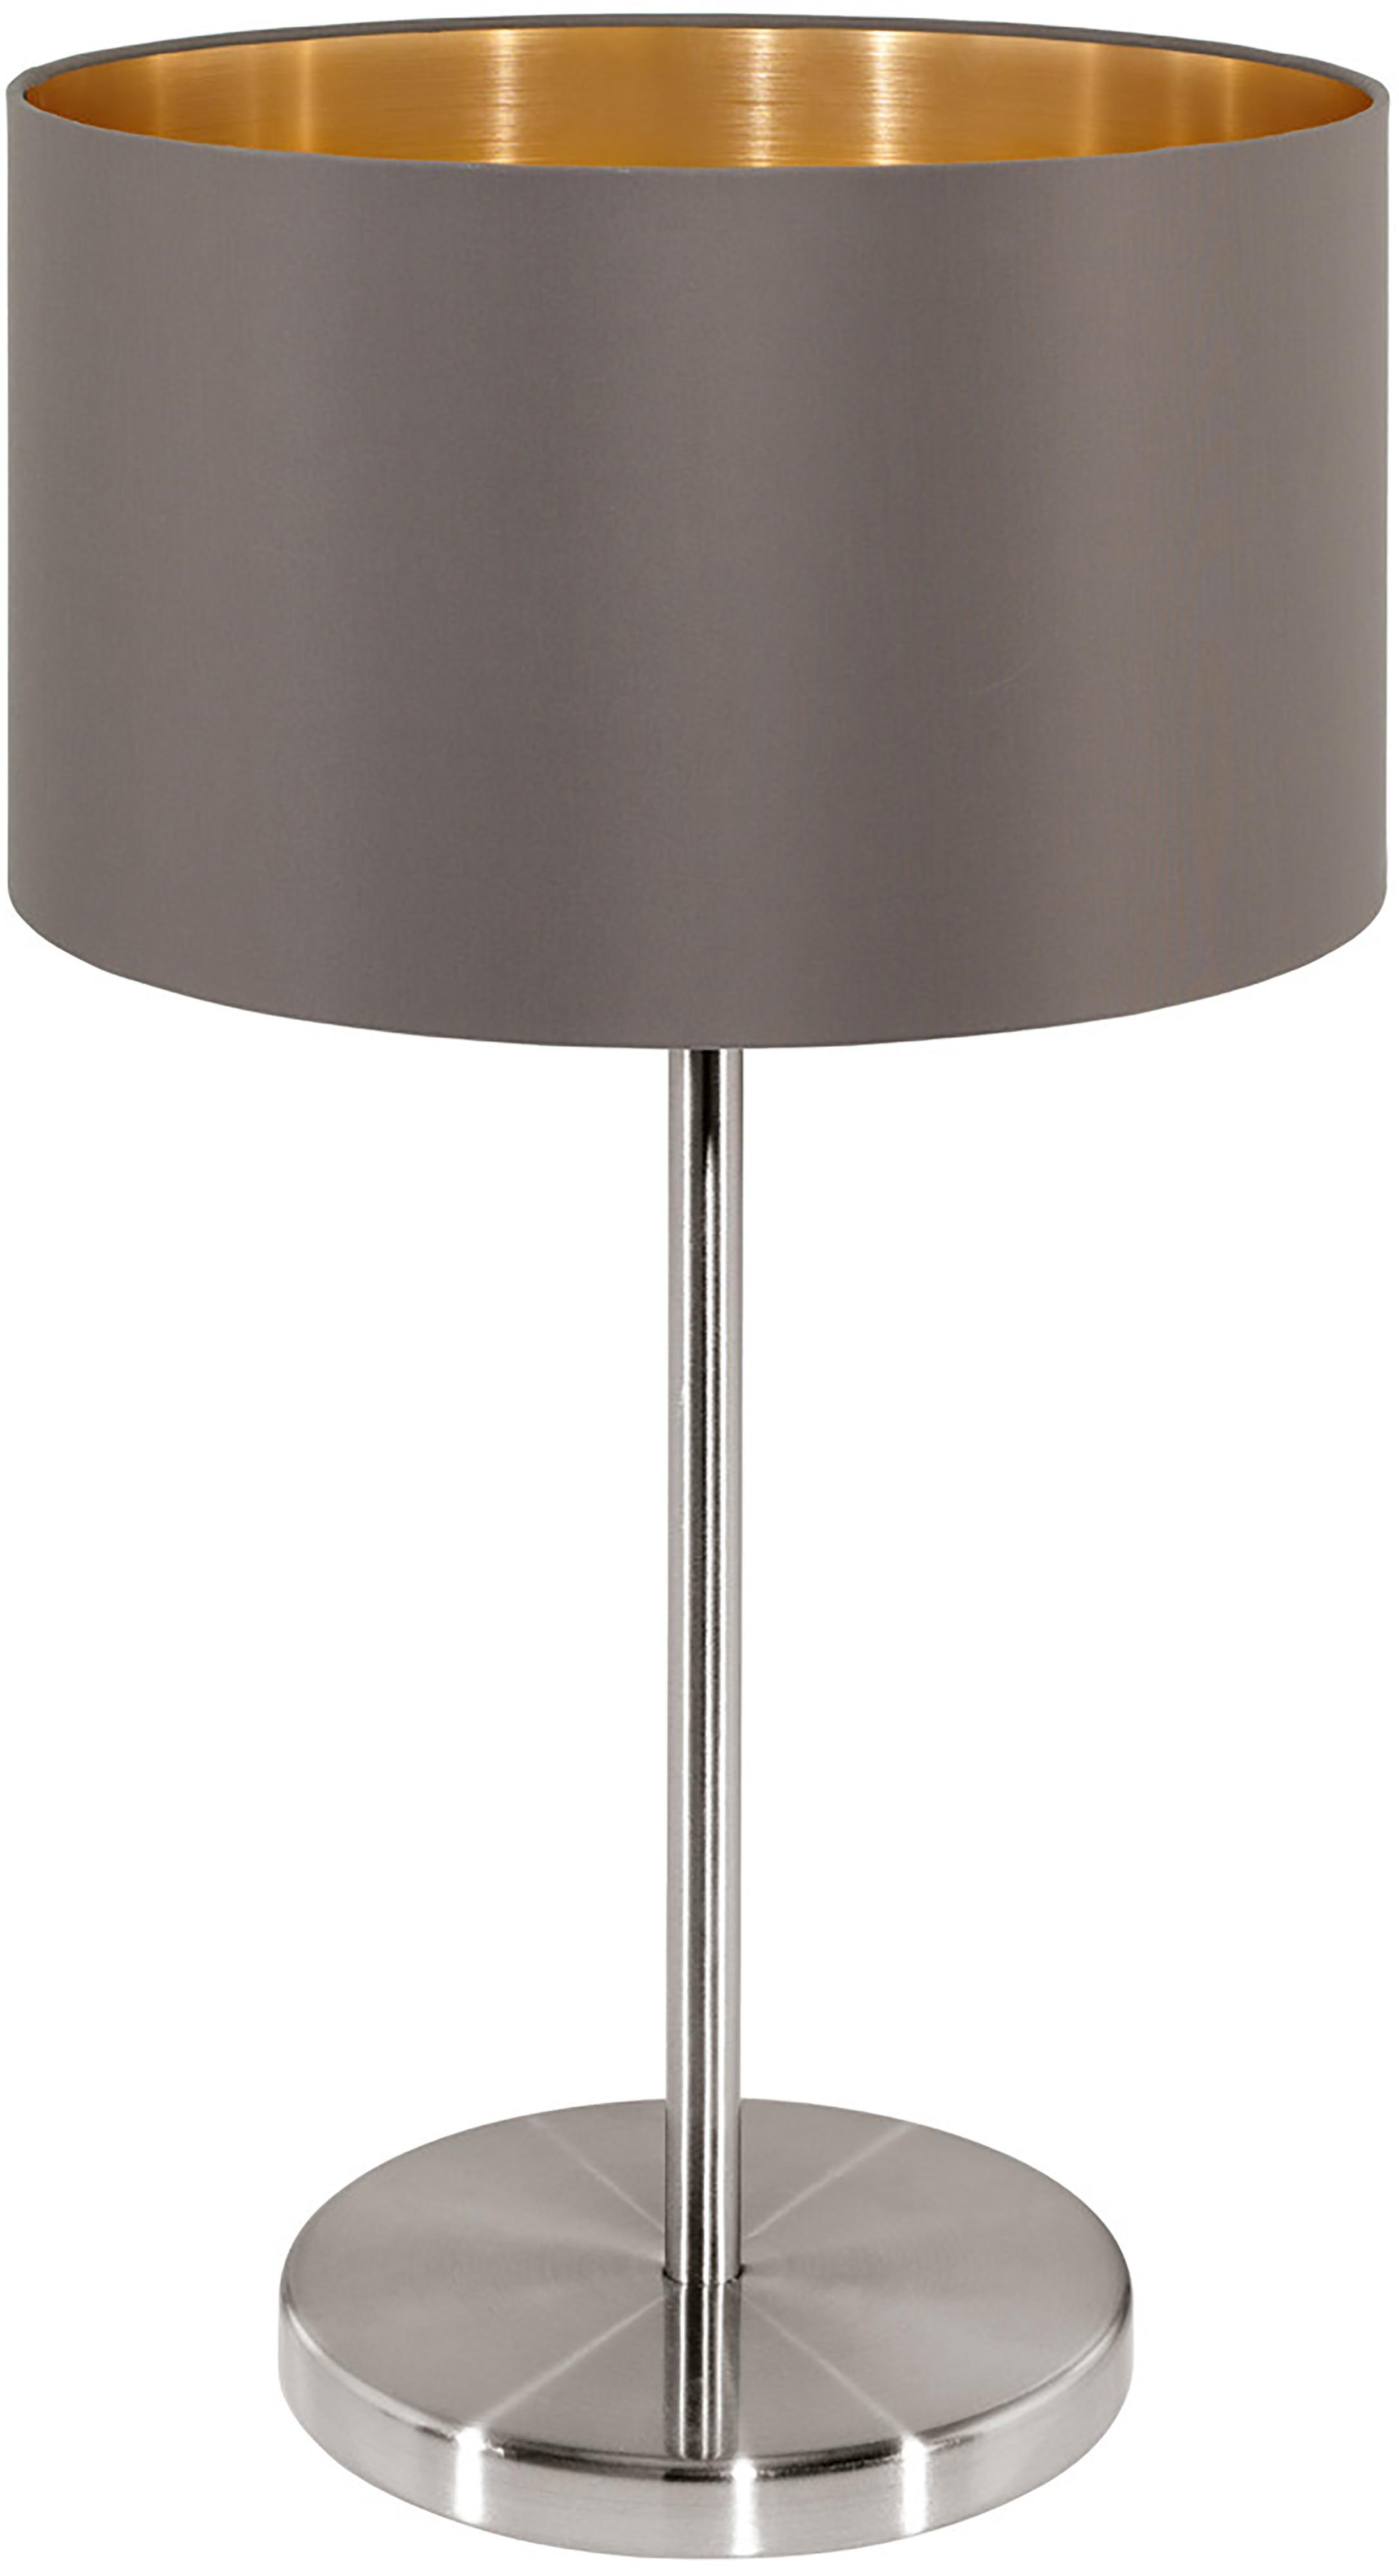 Tafellamp Jamie, Lampvoet: vernikkeld metaal, Fitting: vernikkeld metaal, Grijsbeige, zilverkleurig, Ø 23 x H 42 cm